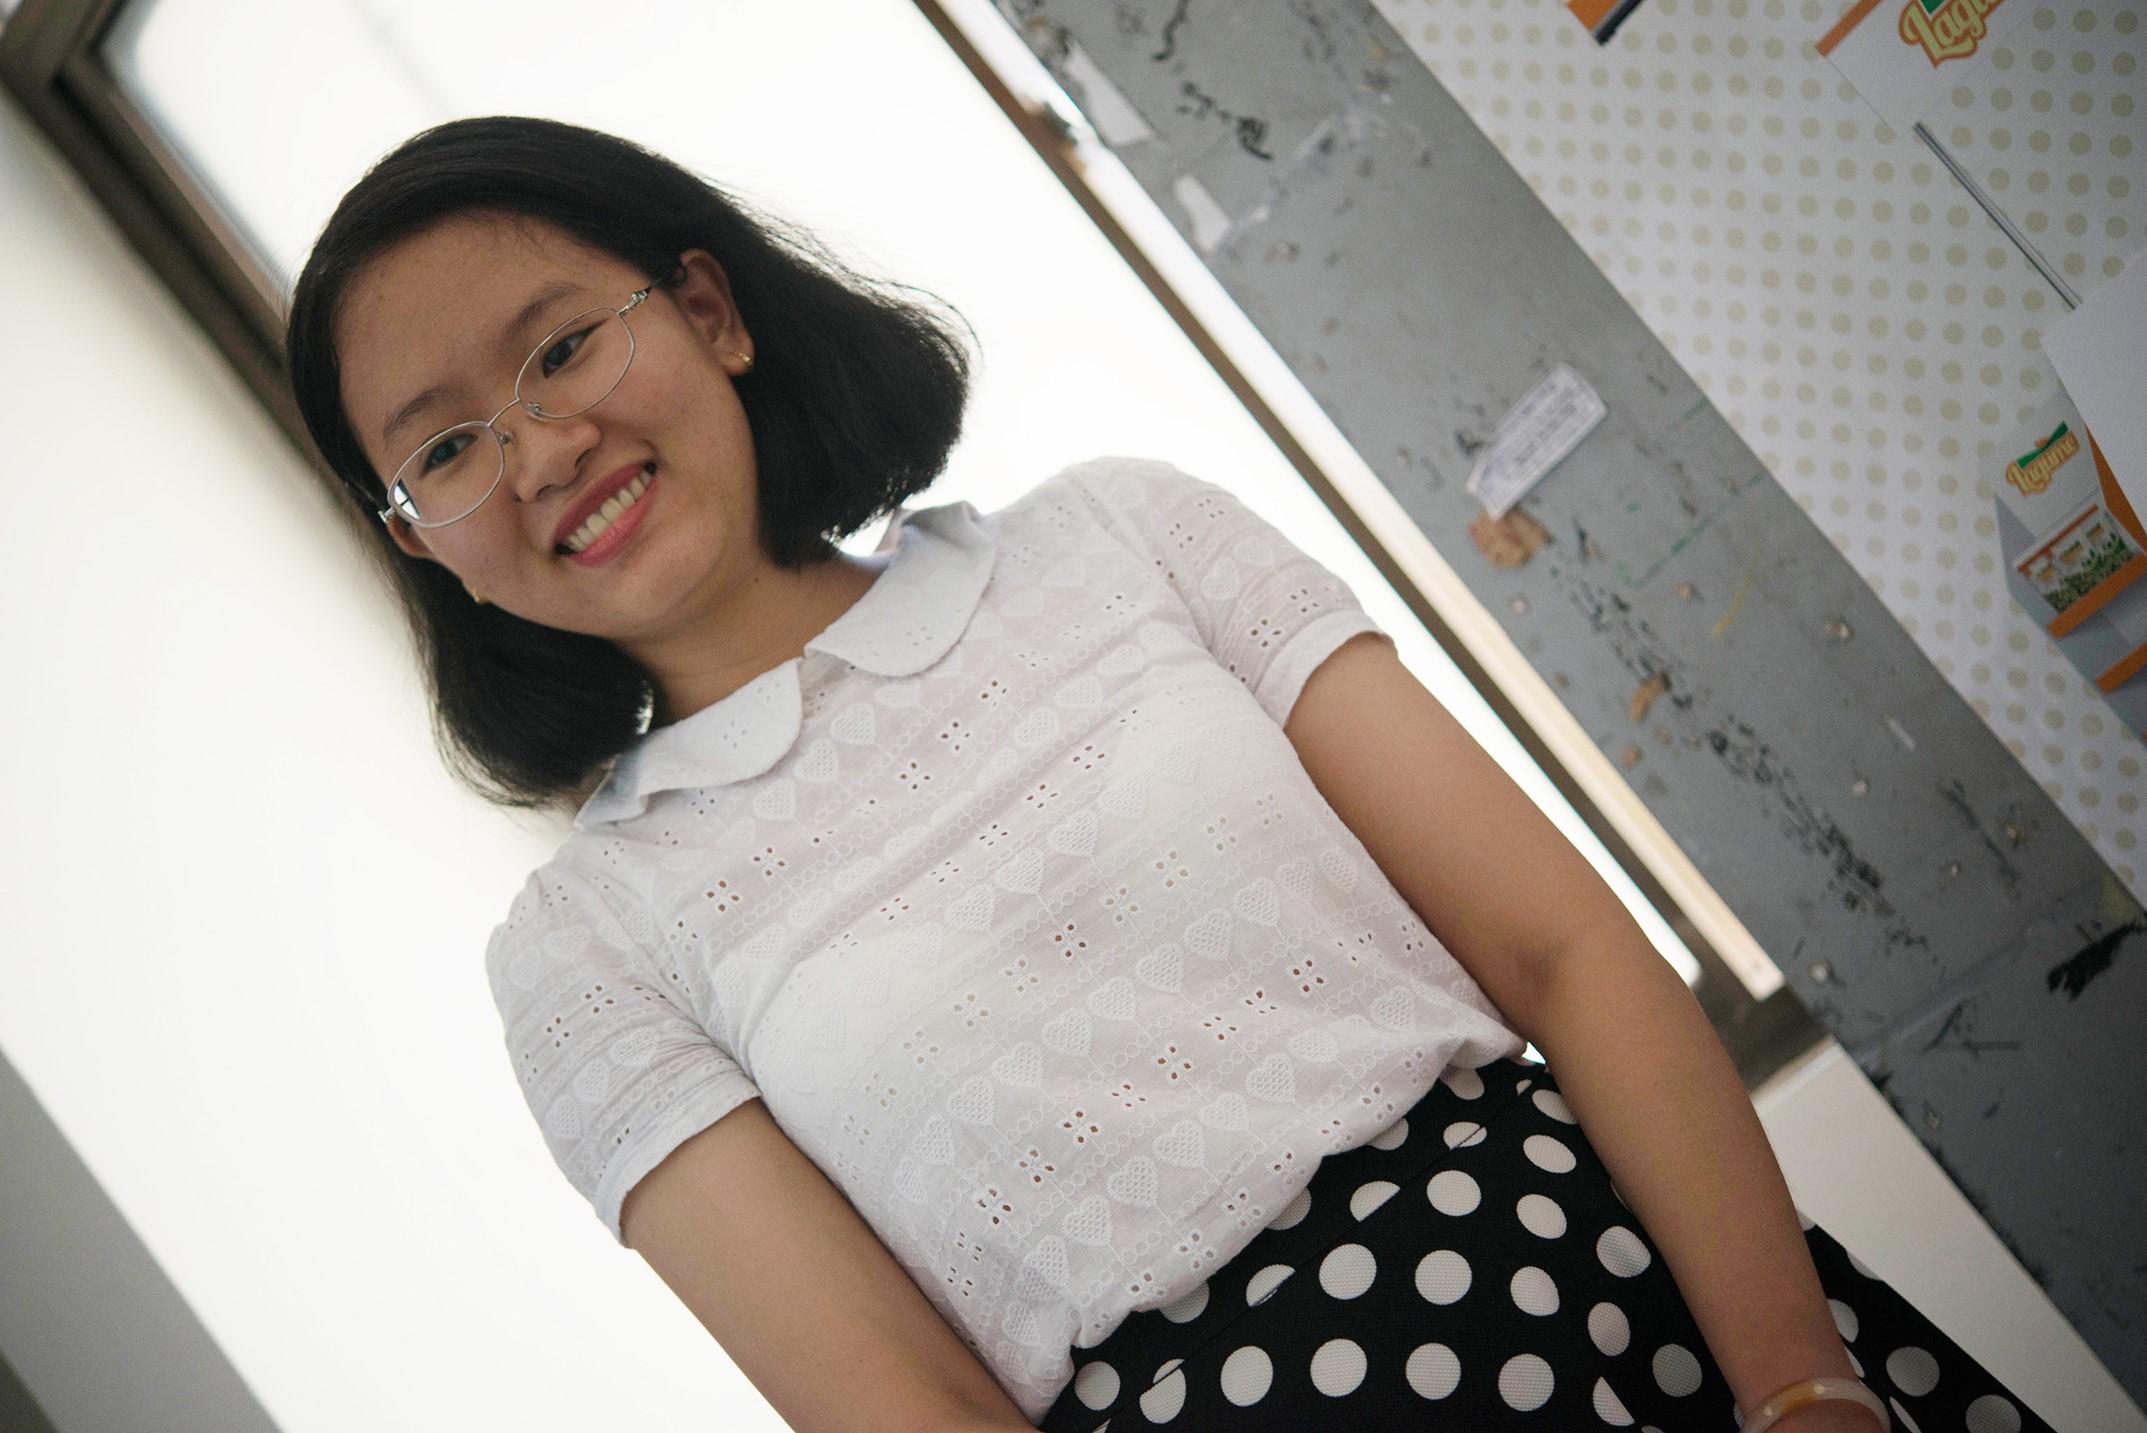 PUBLICS:Le Phuong Thao:Hinh :TOT NGHIEP GD 26:hinh da sua:DSC_1537.jpg